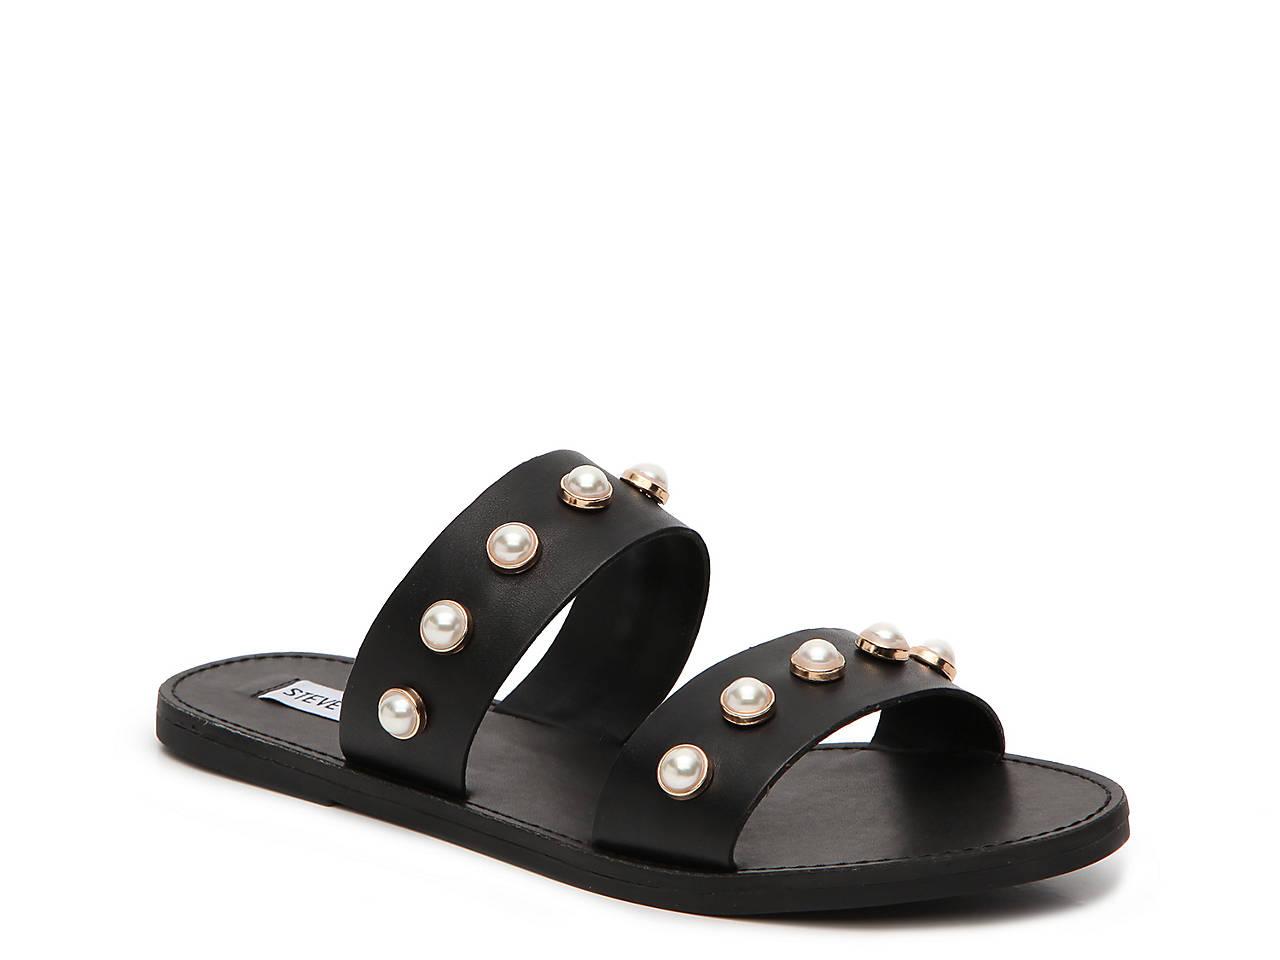 Steve Madden Jole Flat Sandal Women s Shoes